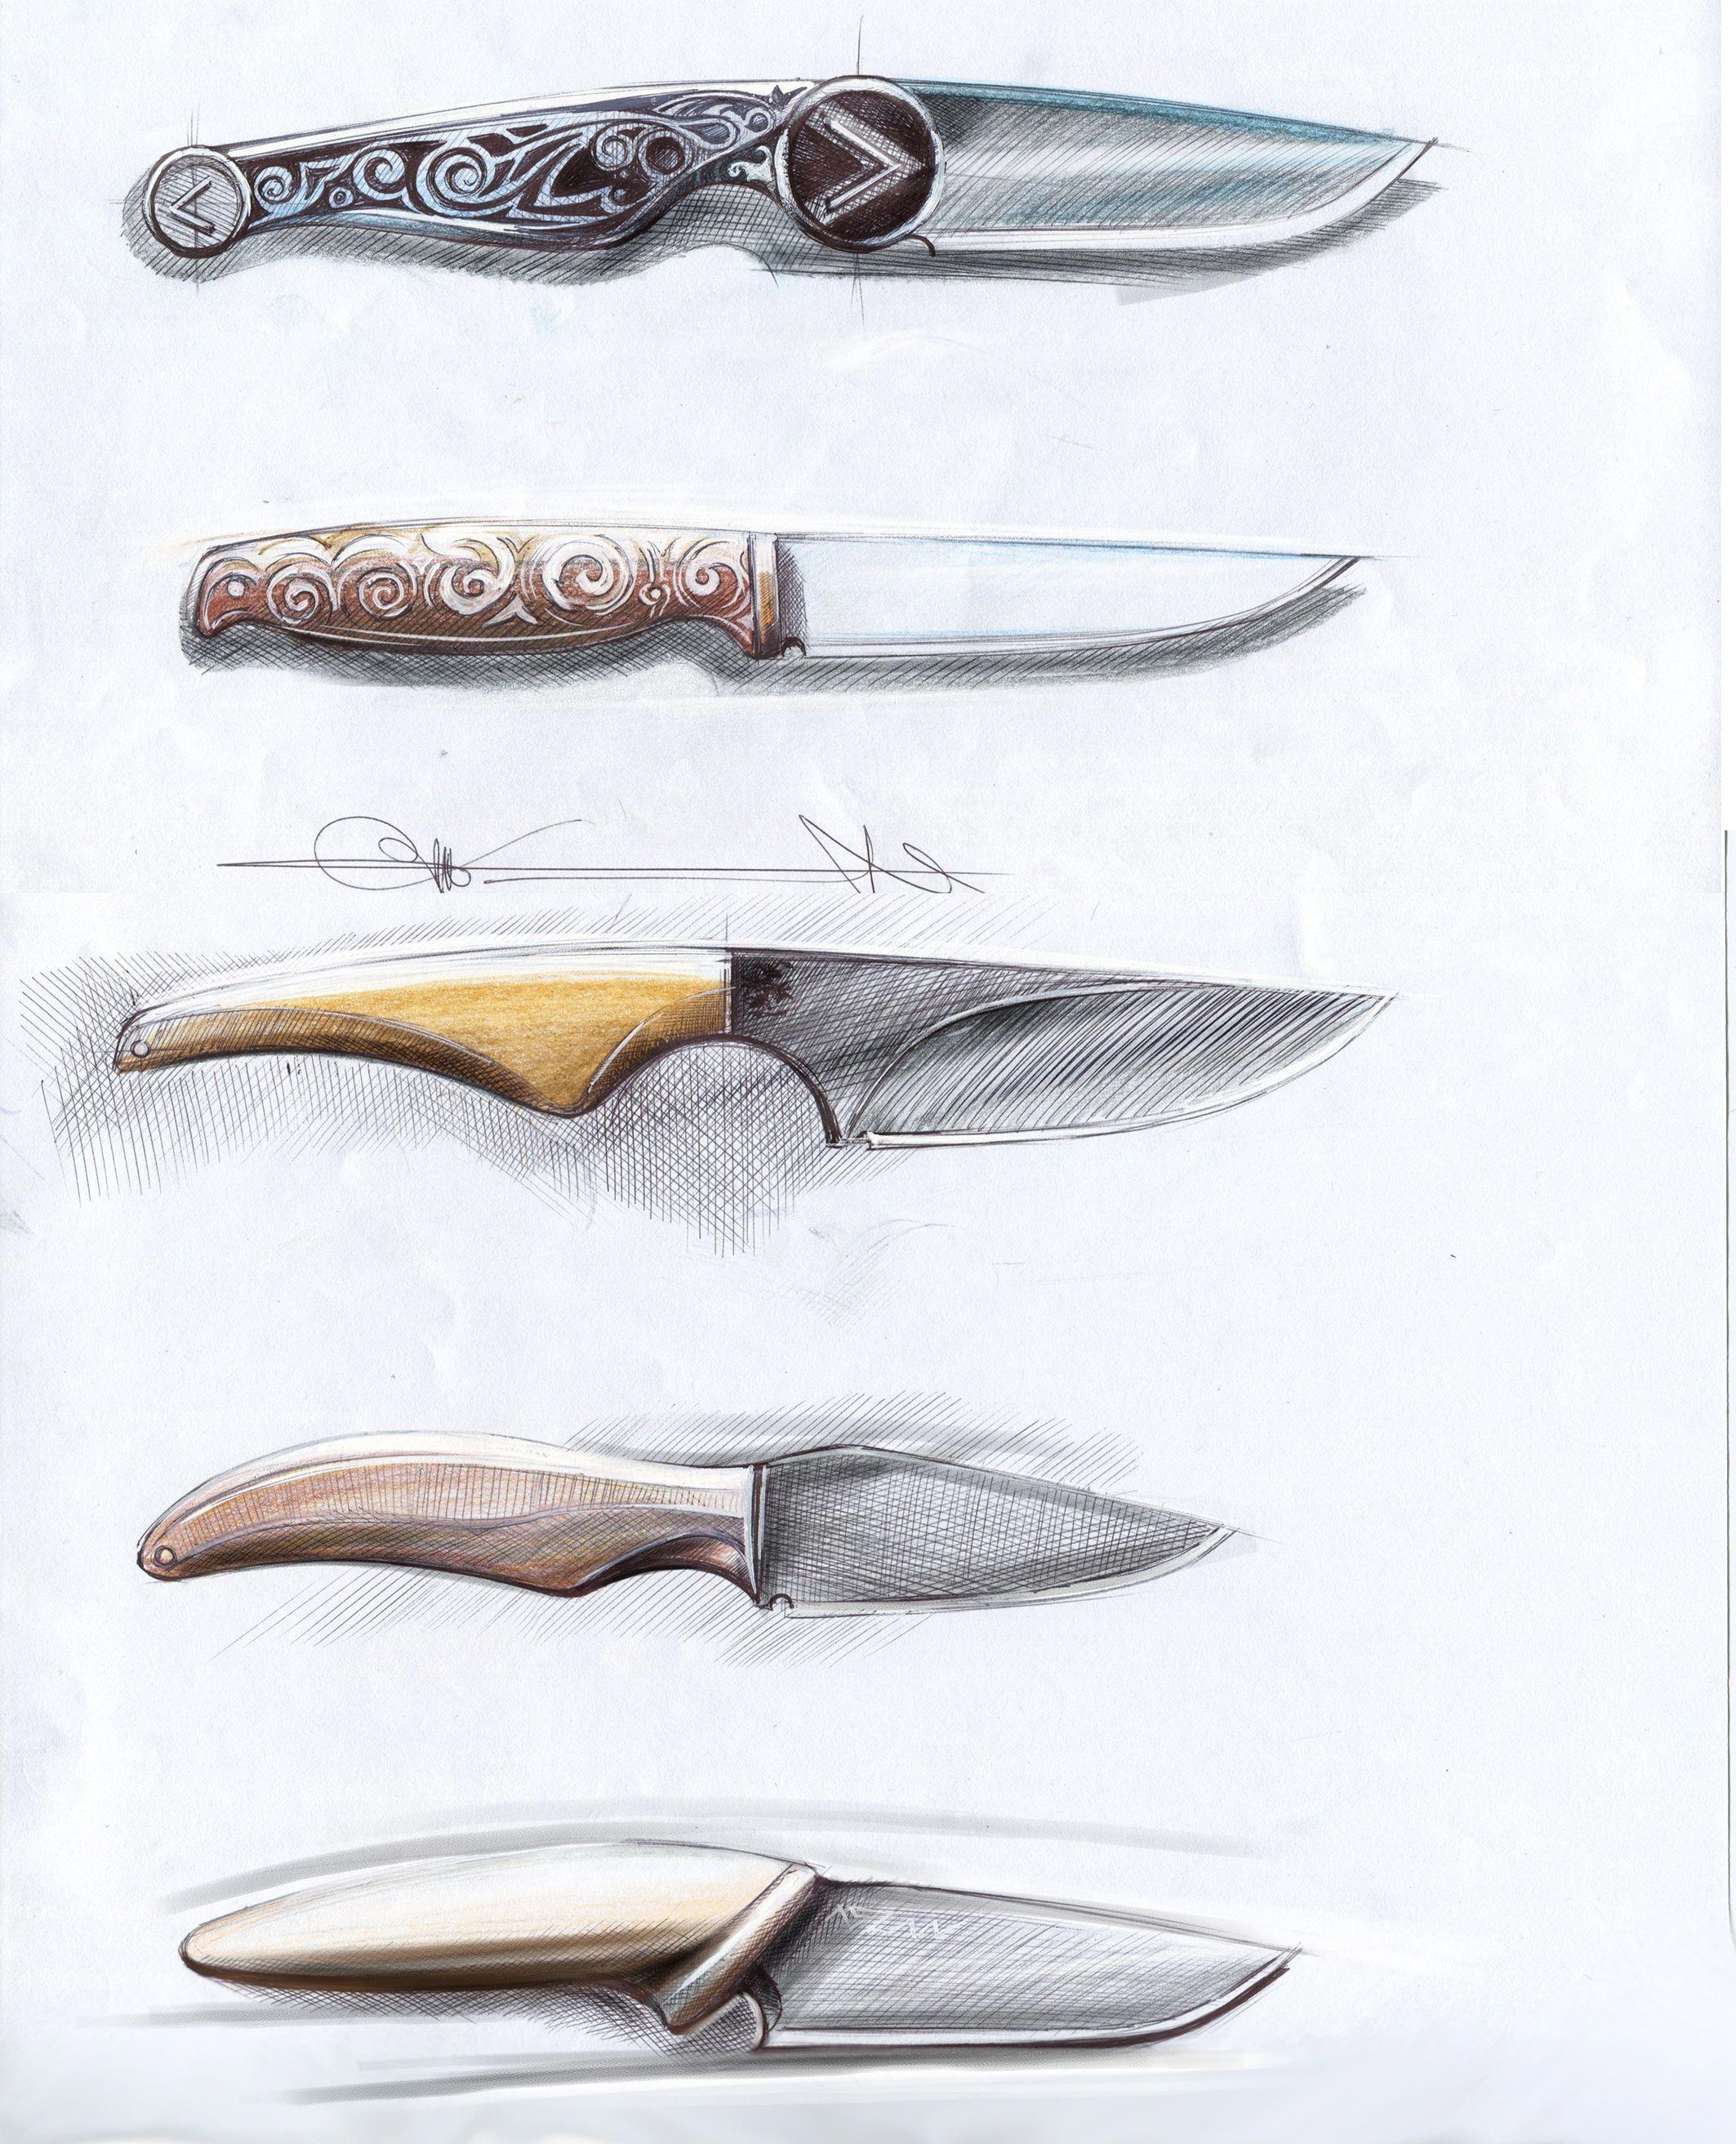 Sketches Knives Knife Art Knife Knife Patterns